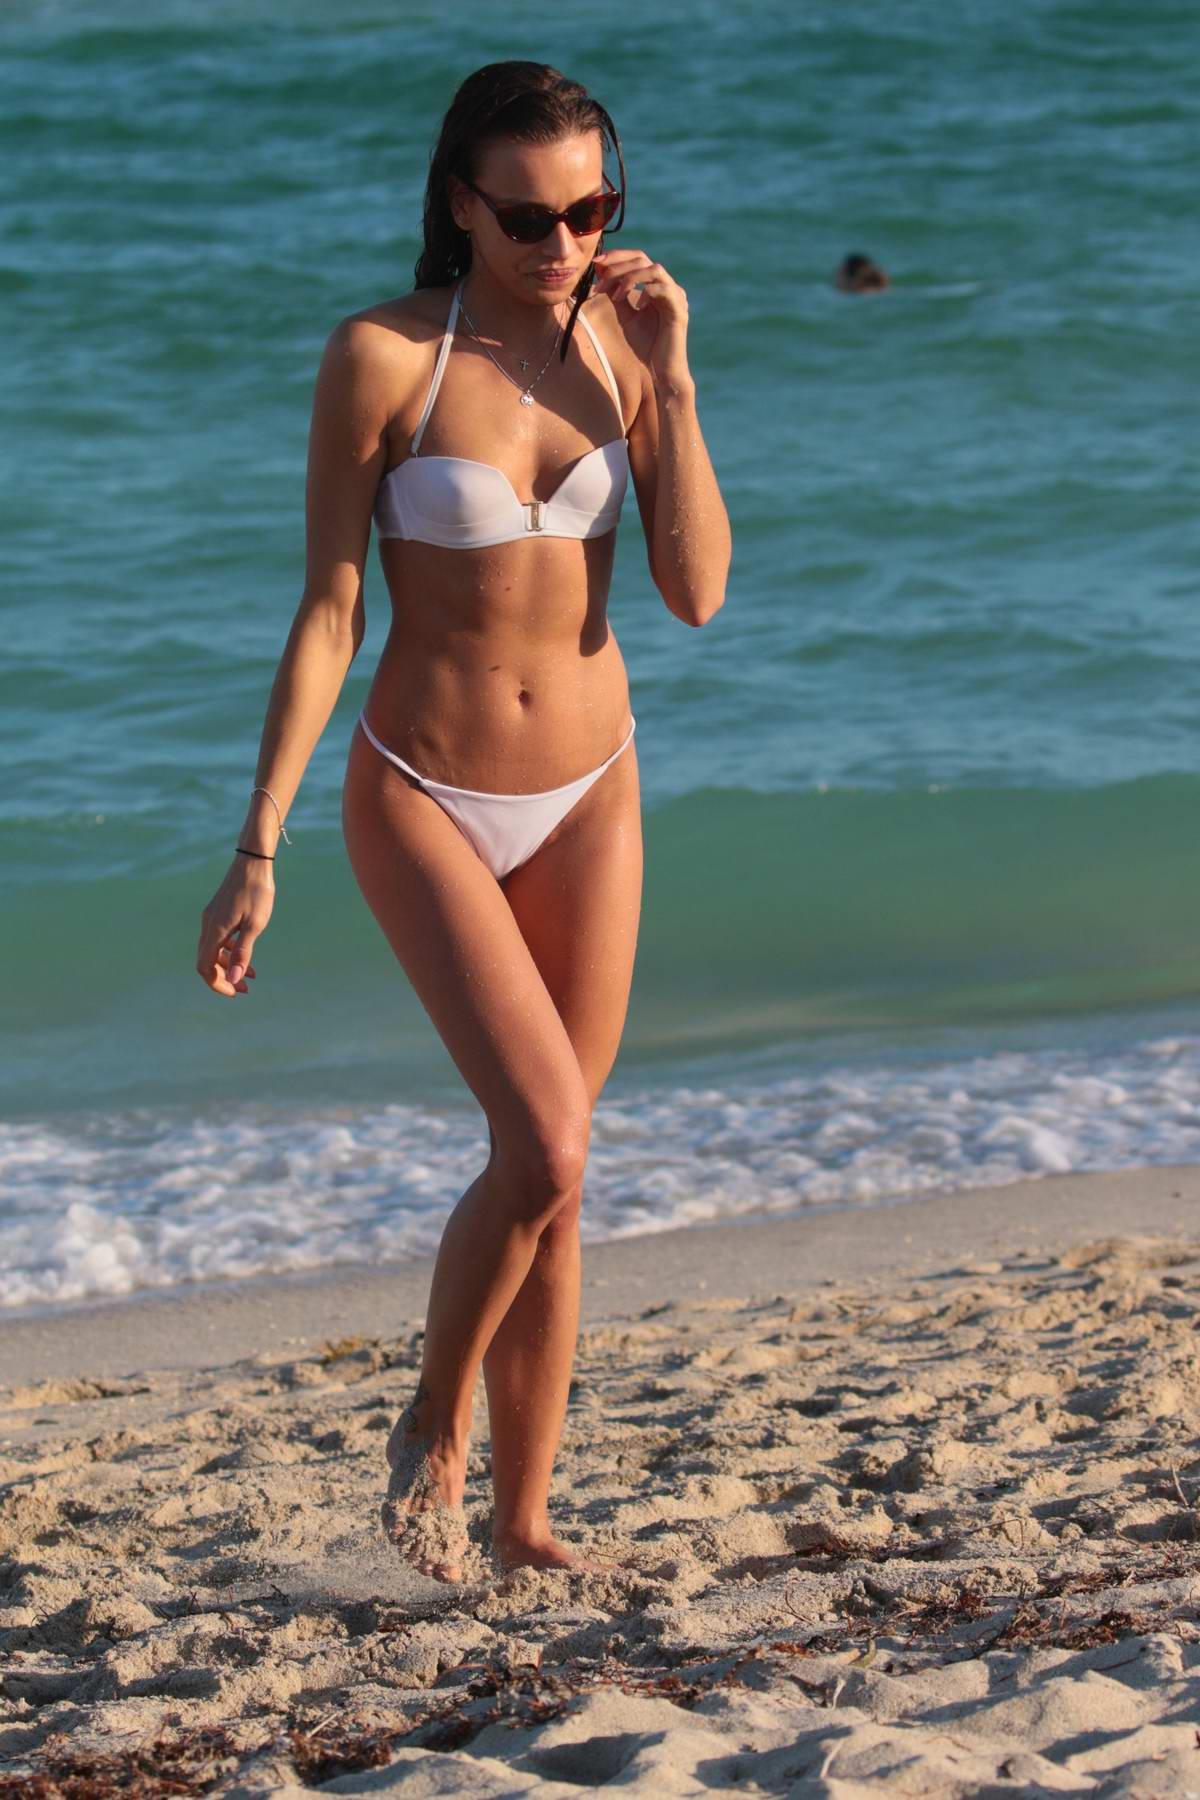 Meri Gulin in a white bikini at the beach in Miami, Florida